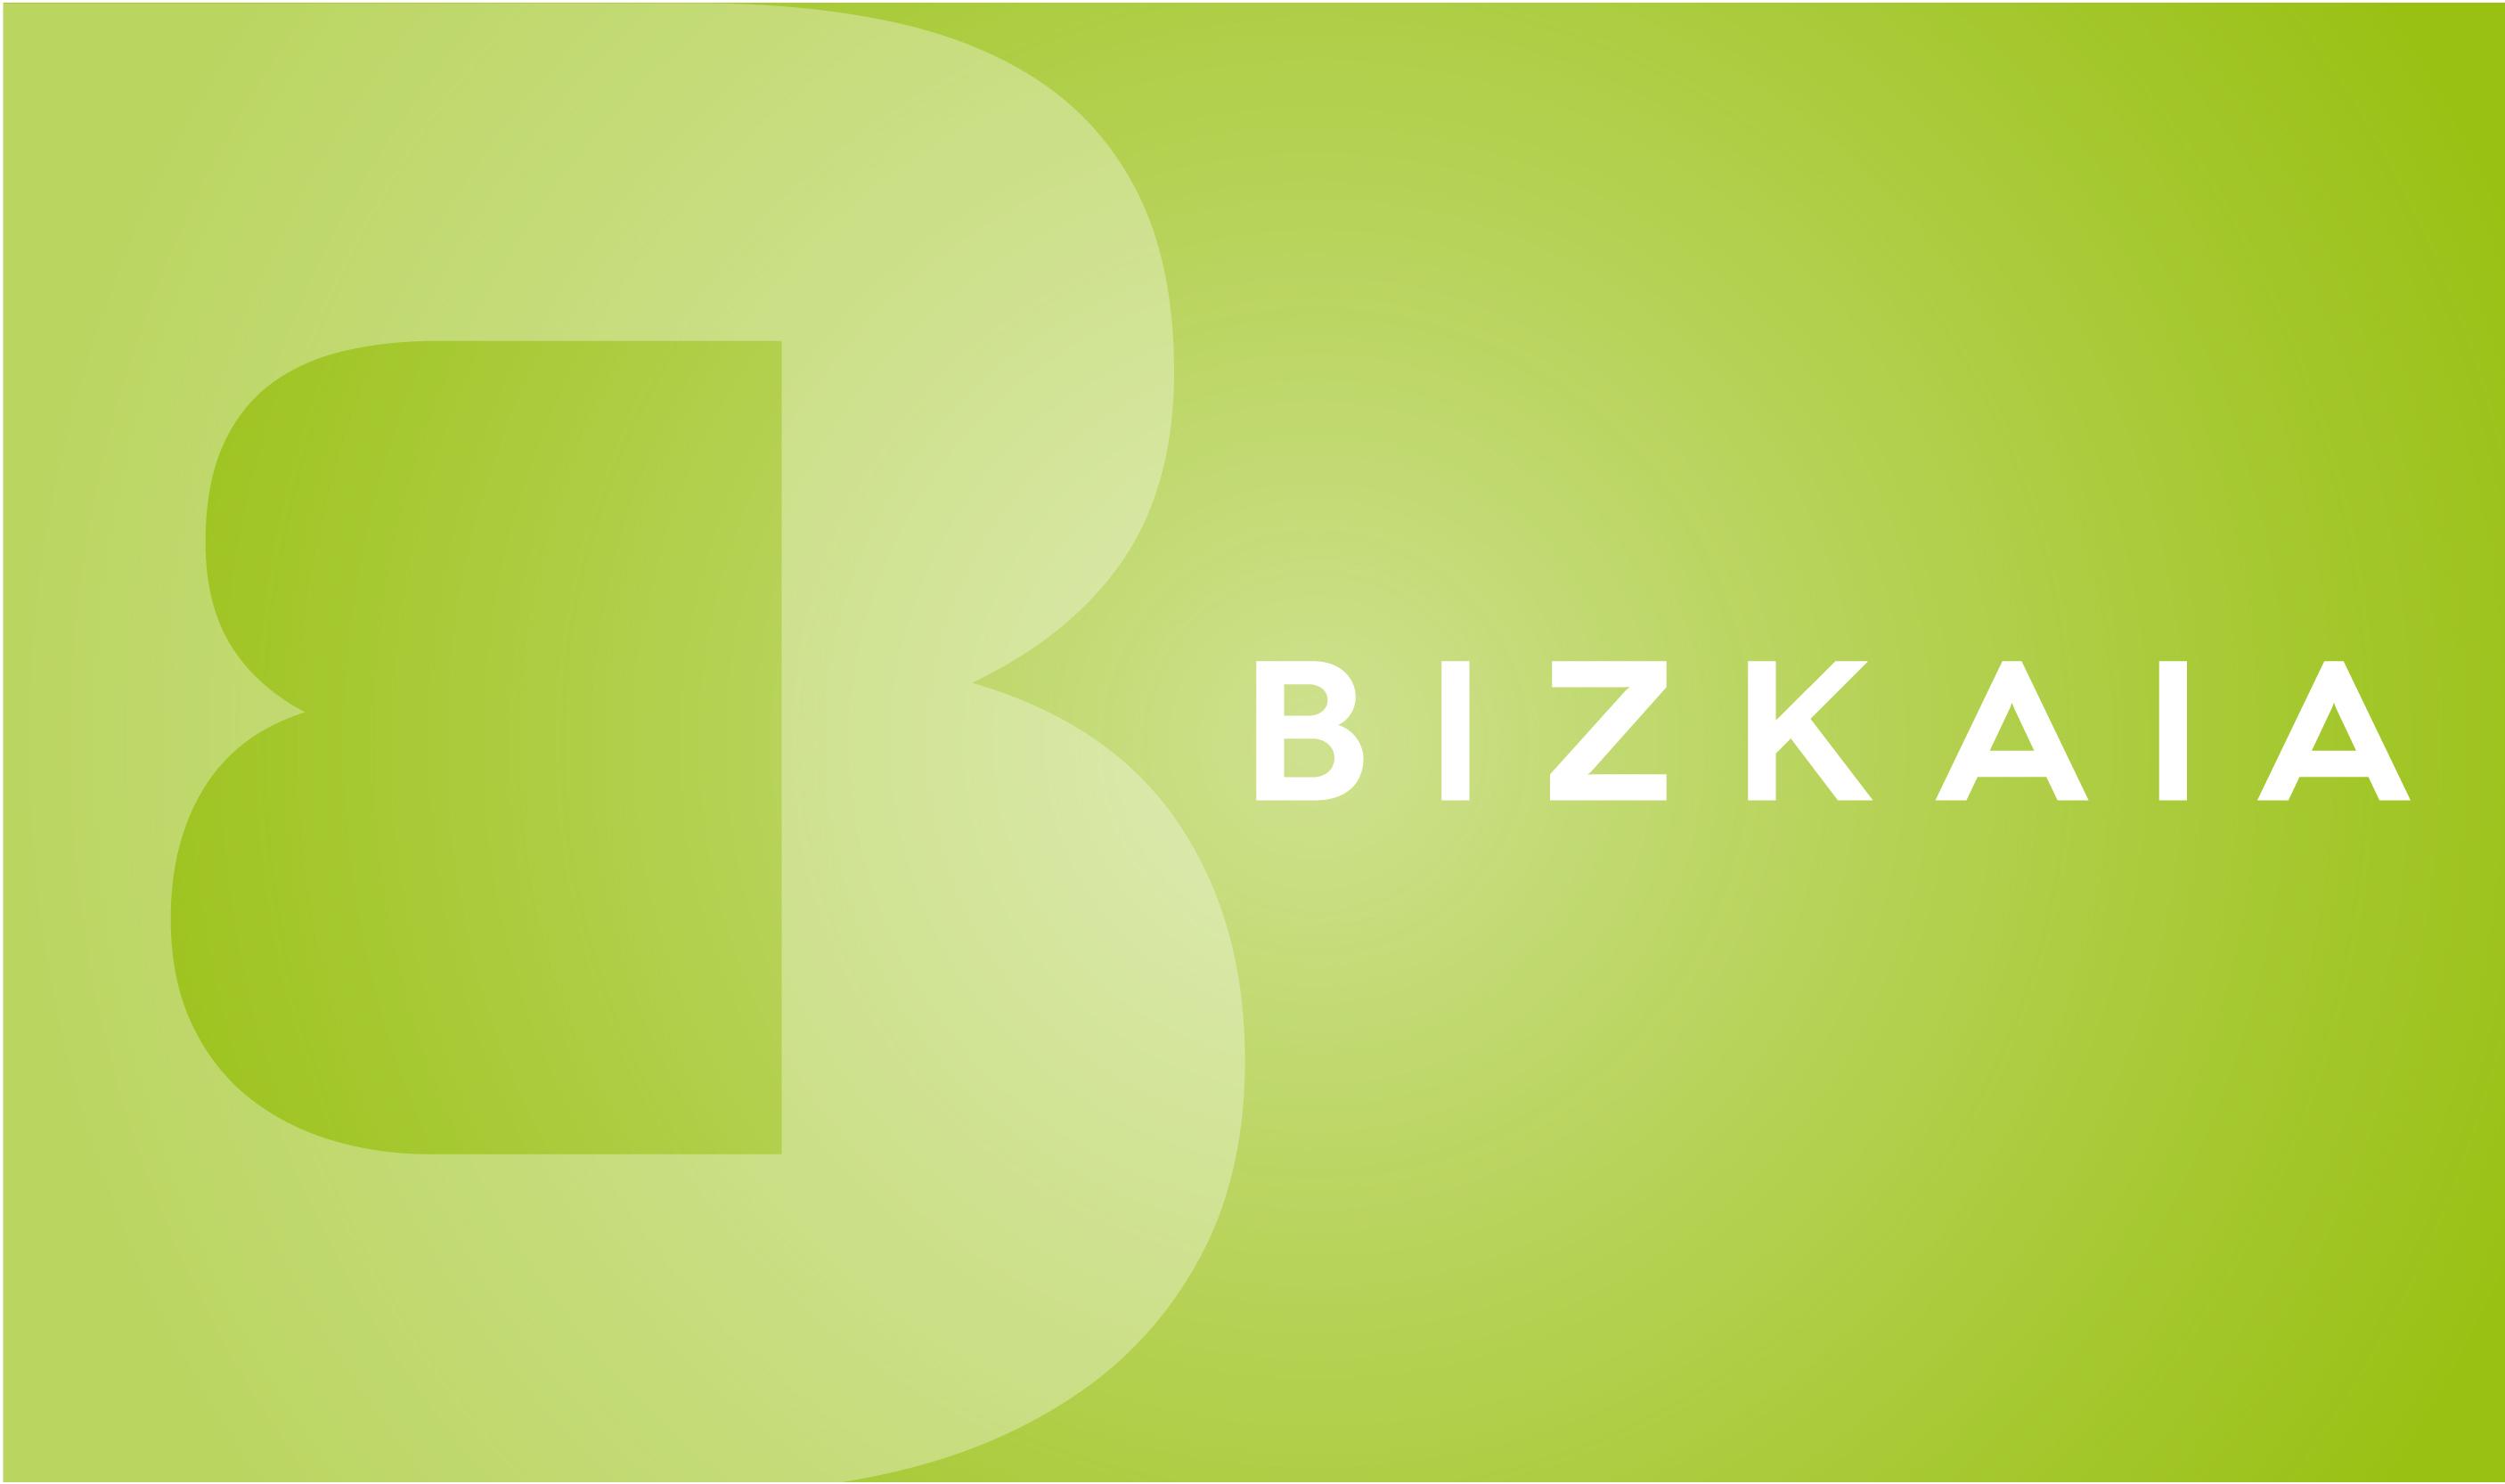 http://grafiksarea.com/wp-content/uploads/bizkaia-berdea.jpg